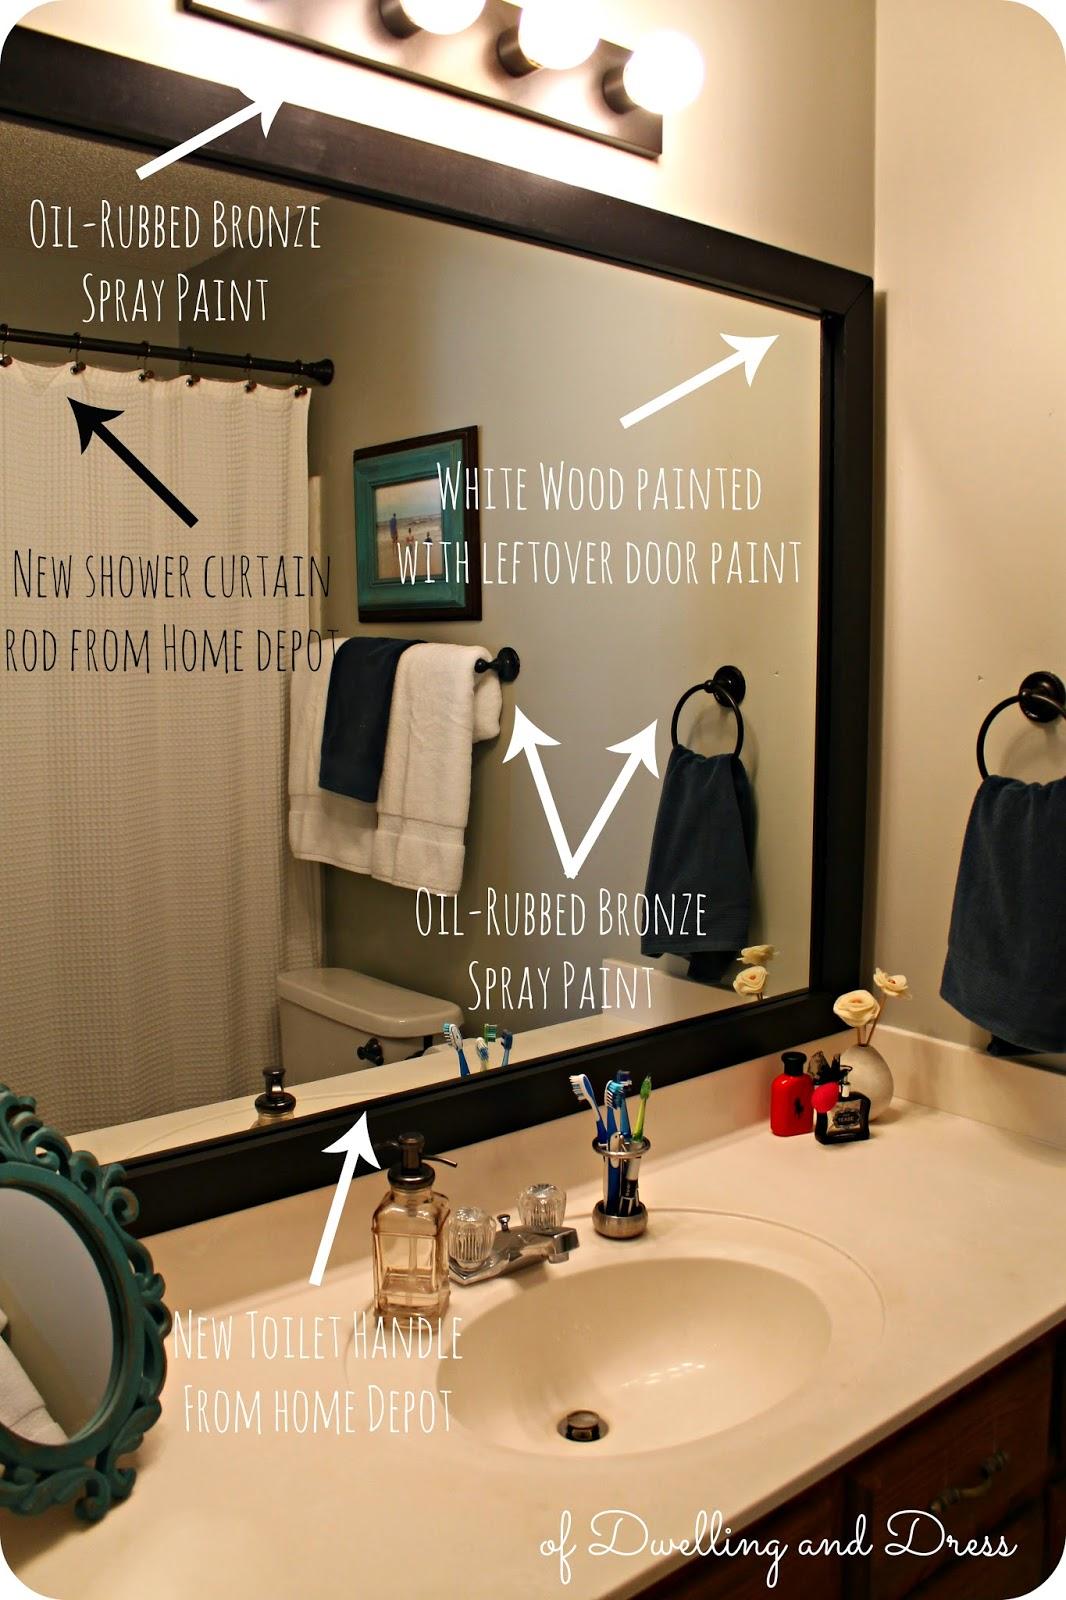 Of dwelling and dress home tour master bathroom rox 39 s for Megan u bathroom tour